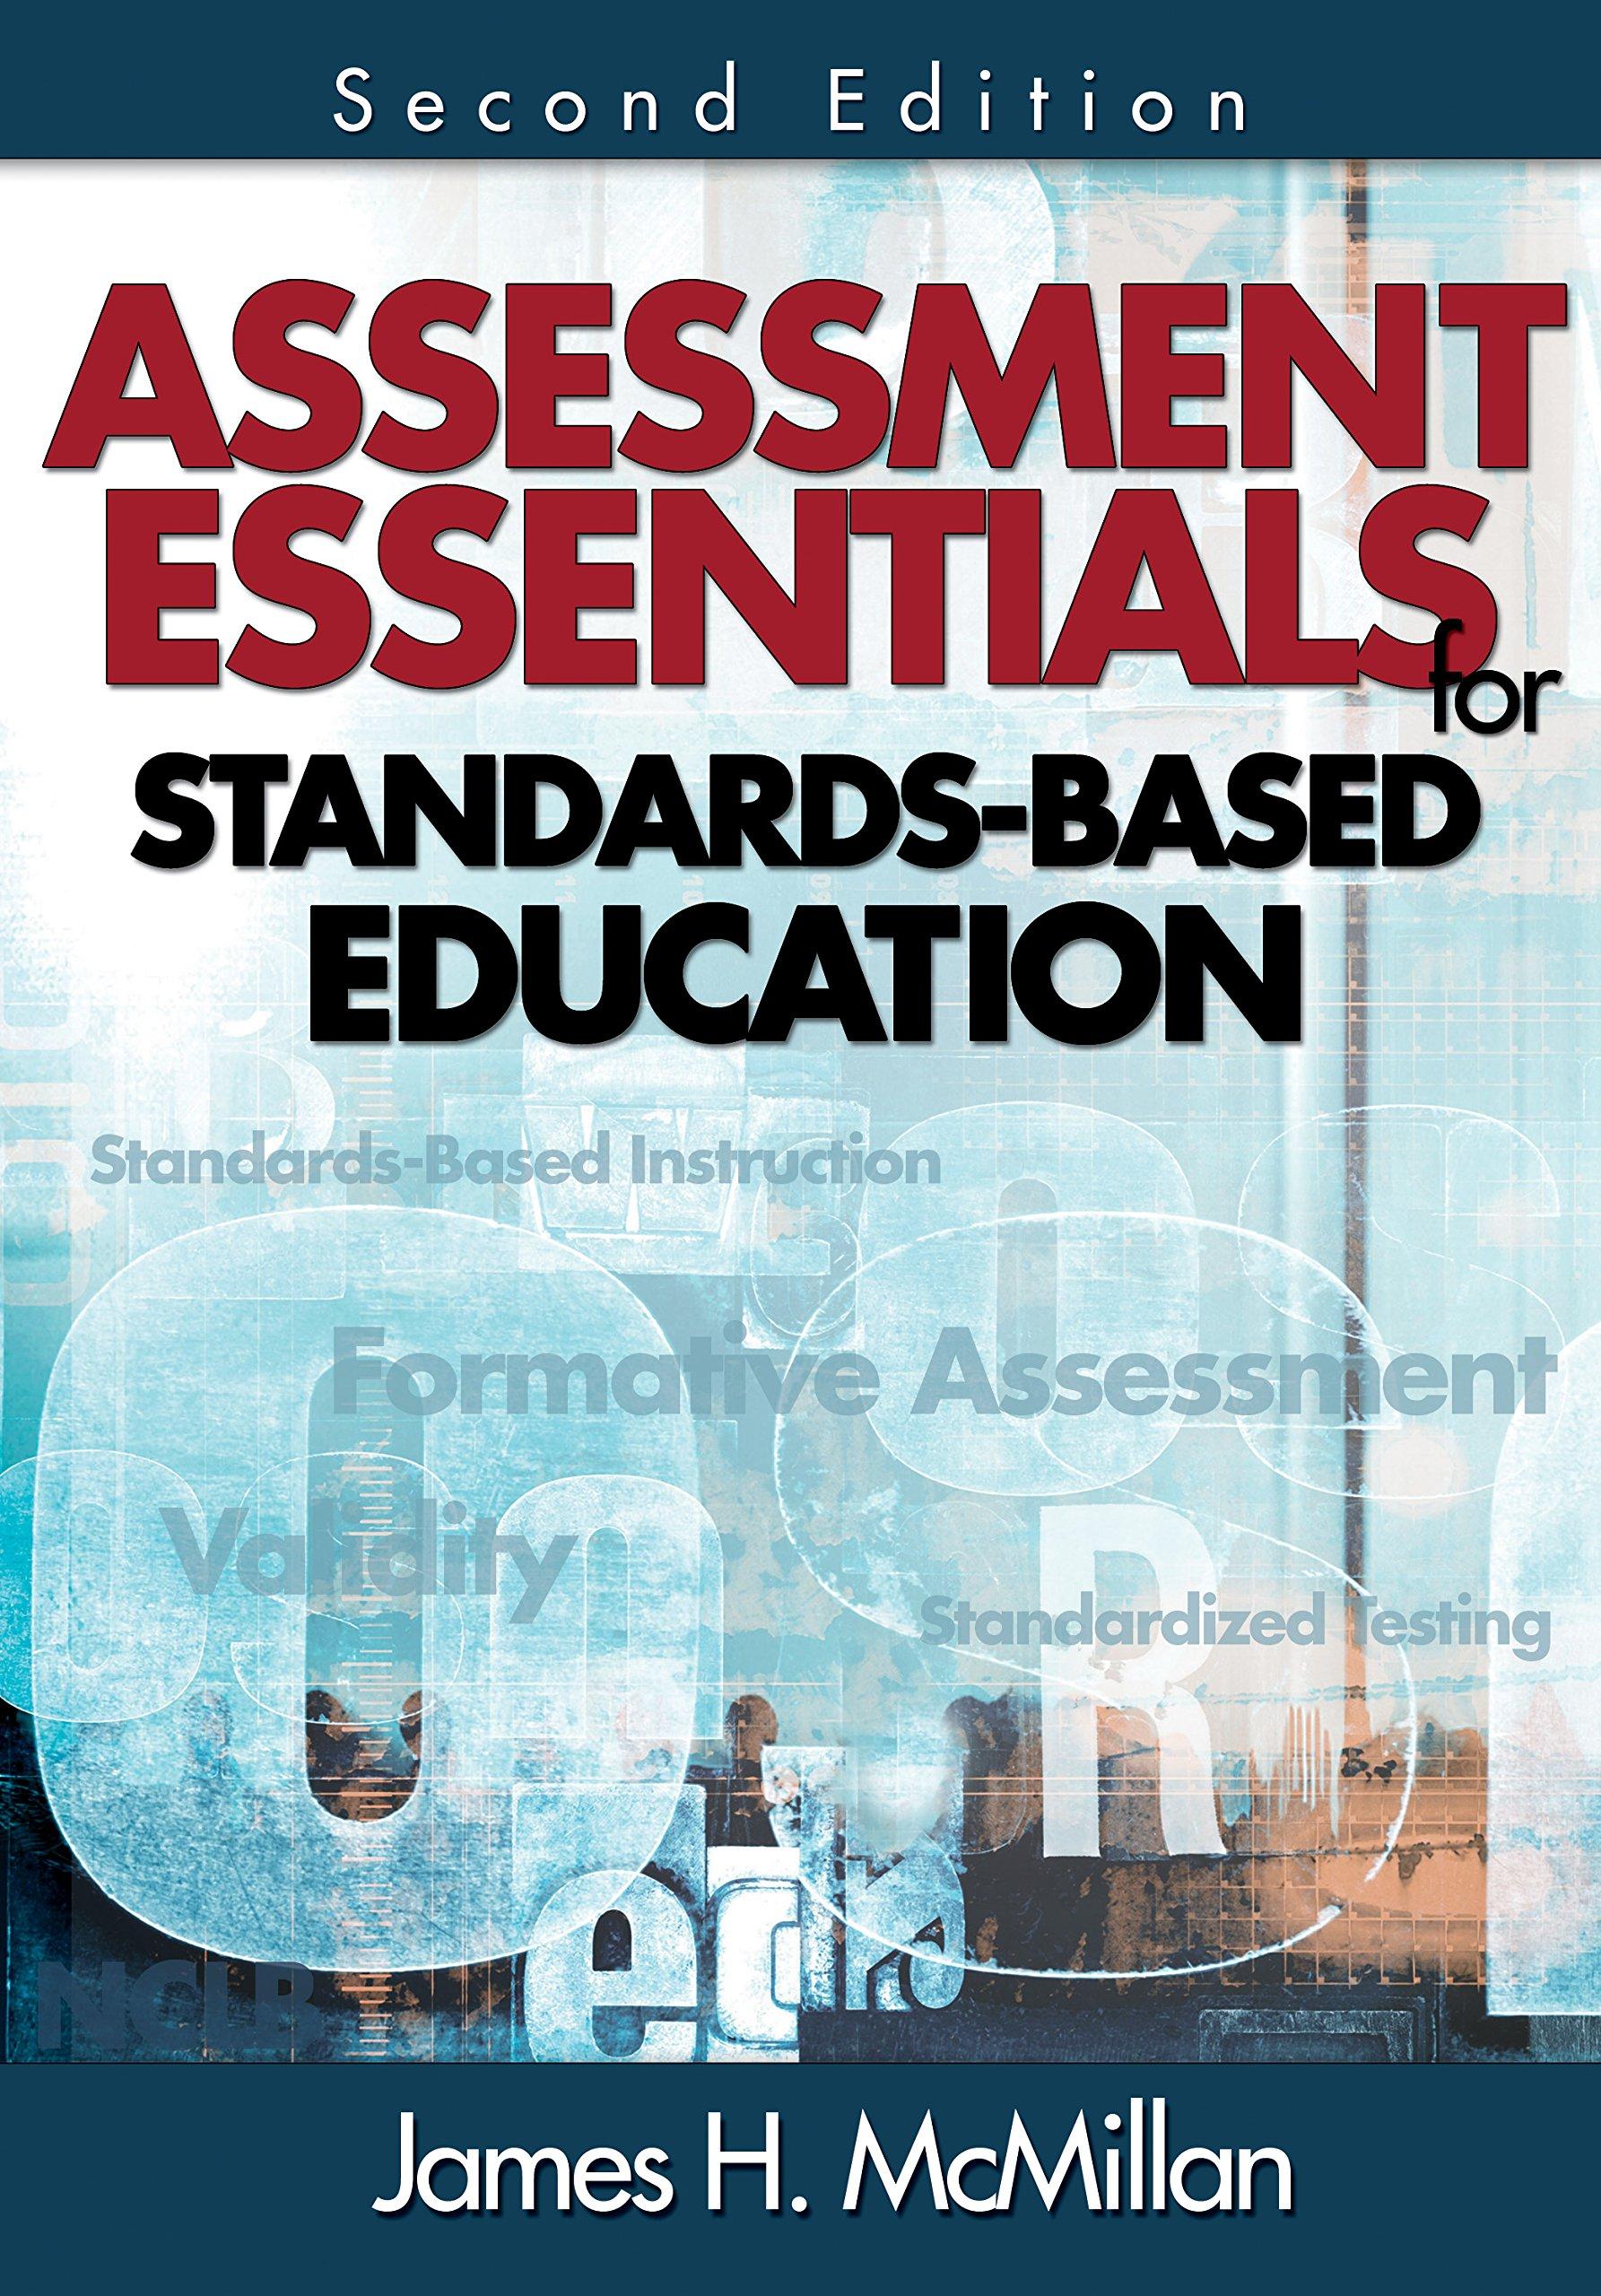 Assessment Essentials for Standards-Based Education